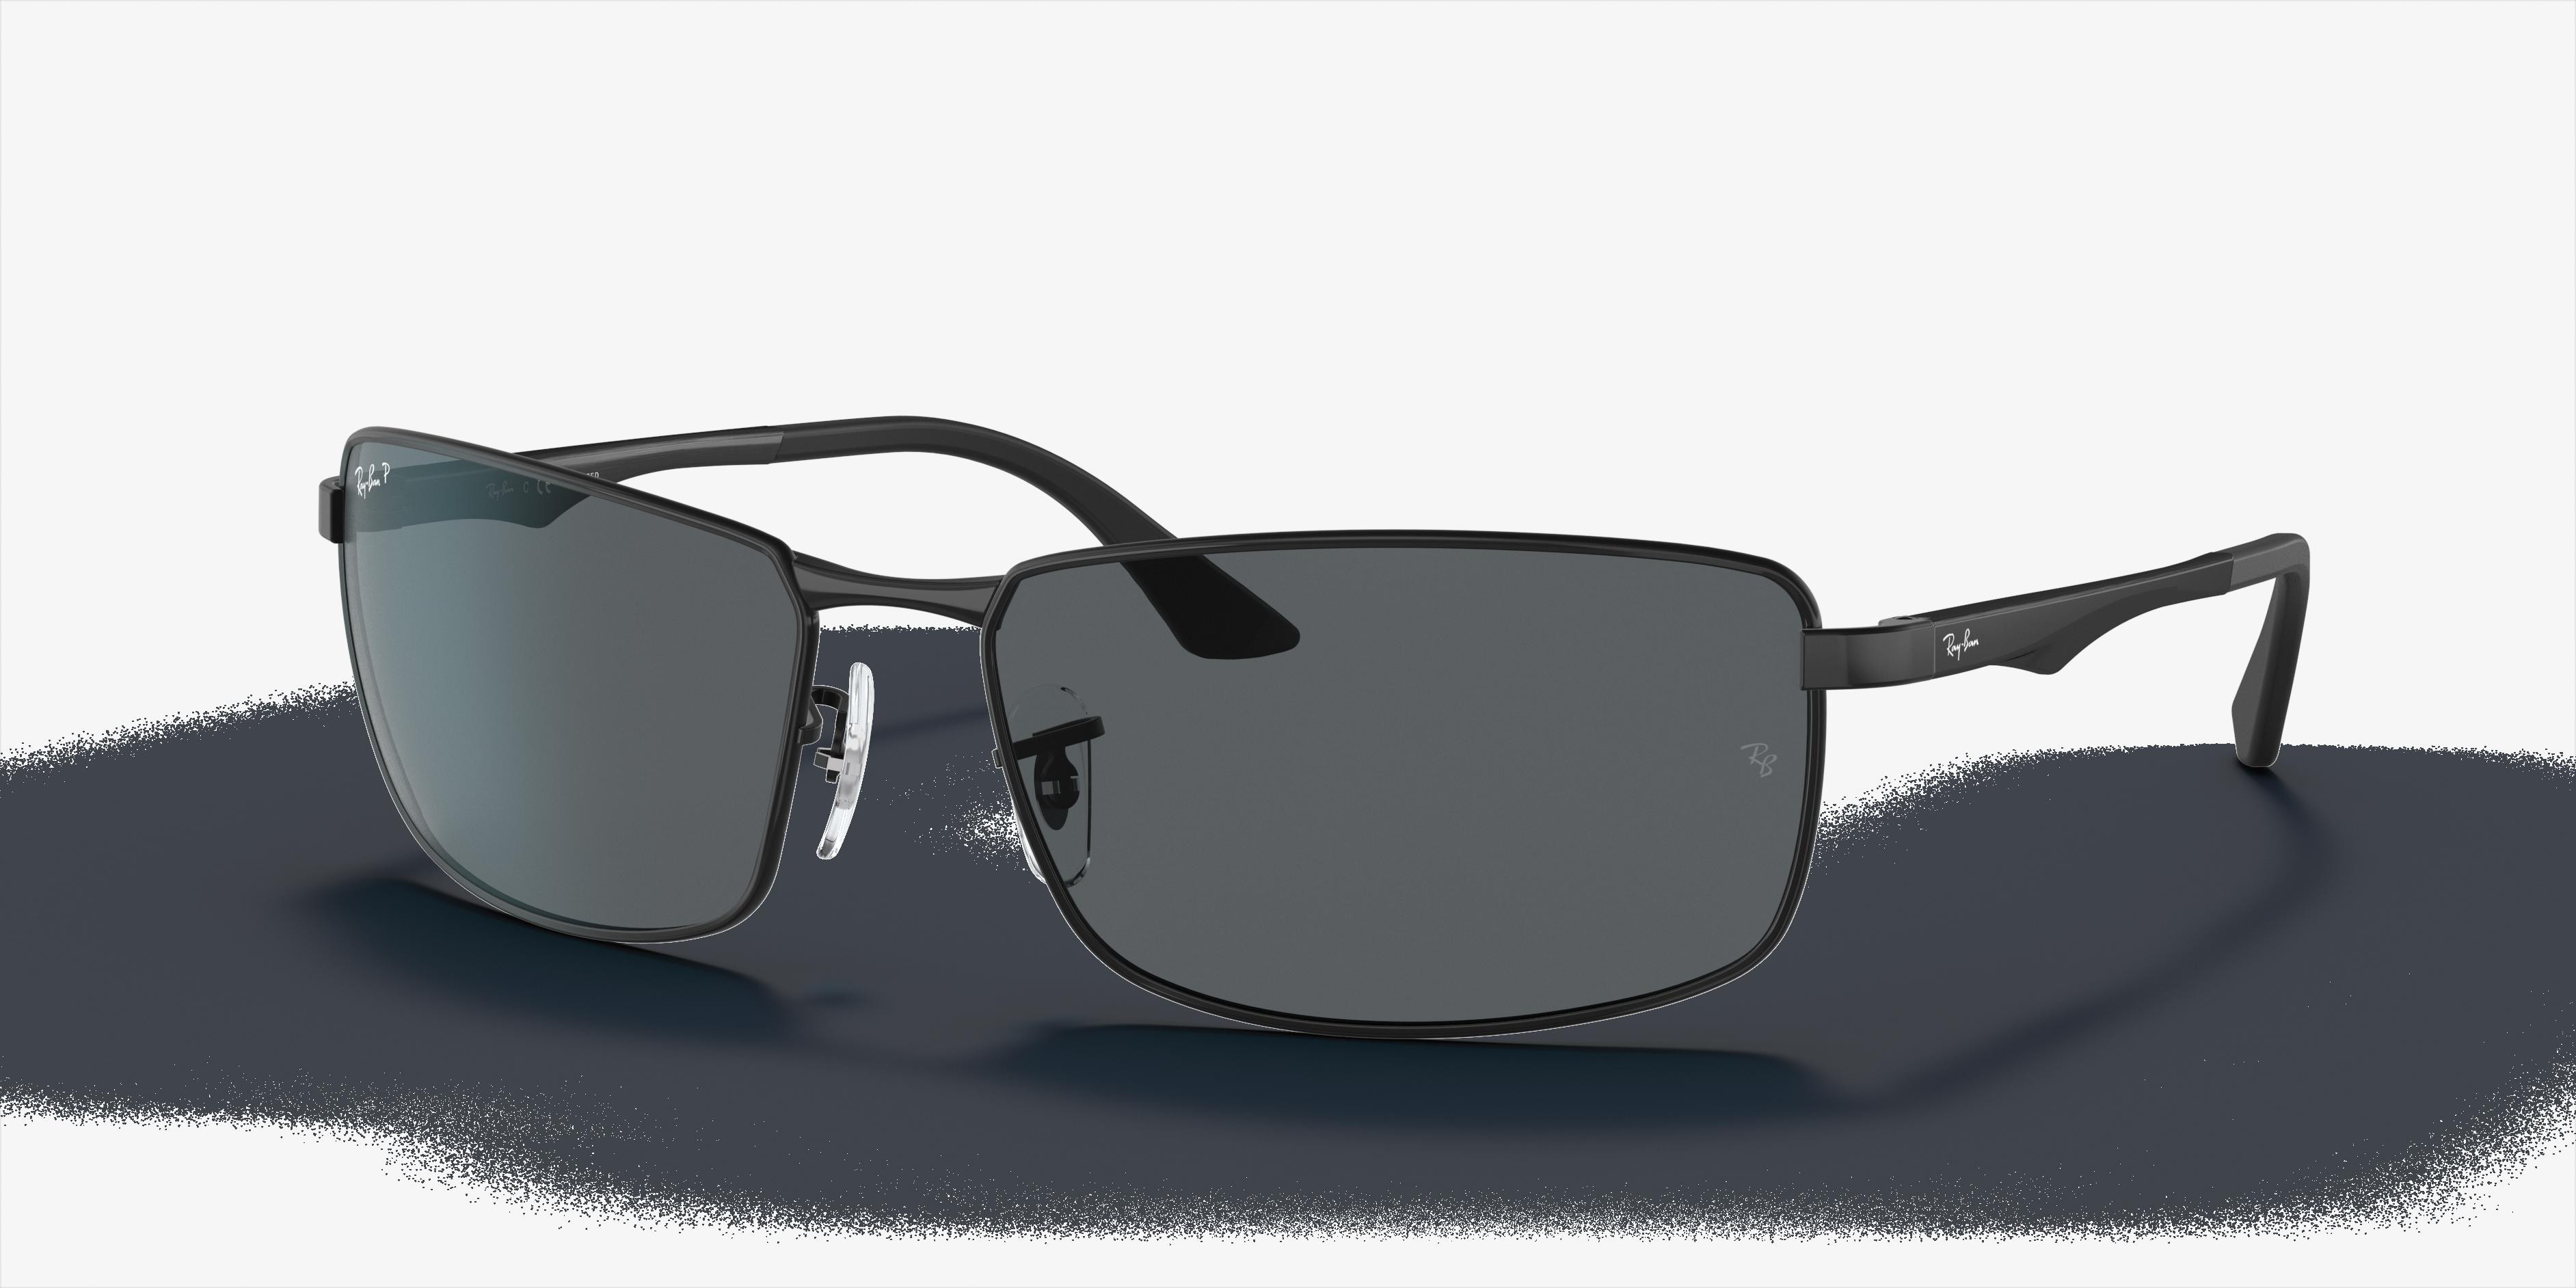 Ray-Ban Rb3498 Black, Polarized Gray Lenses - RB3498